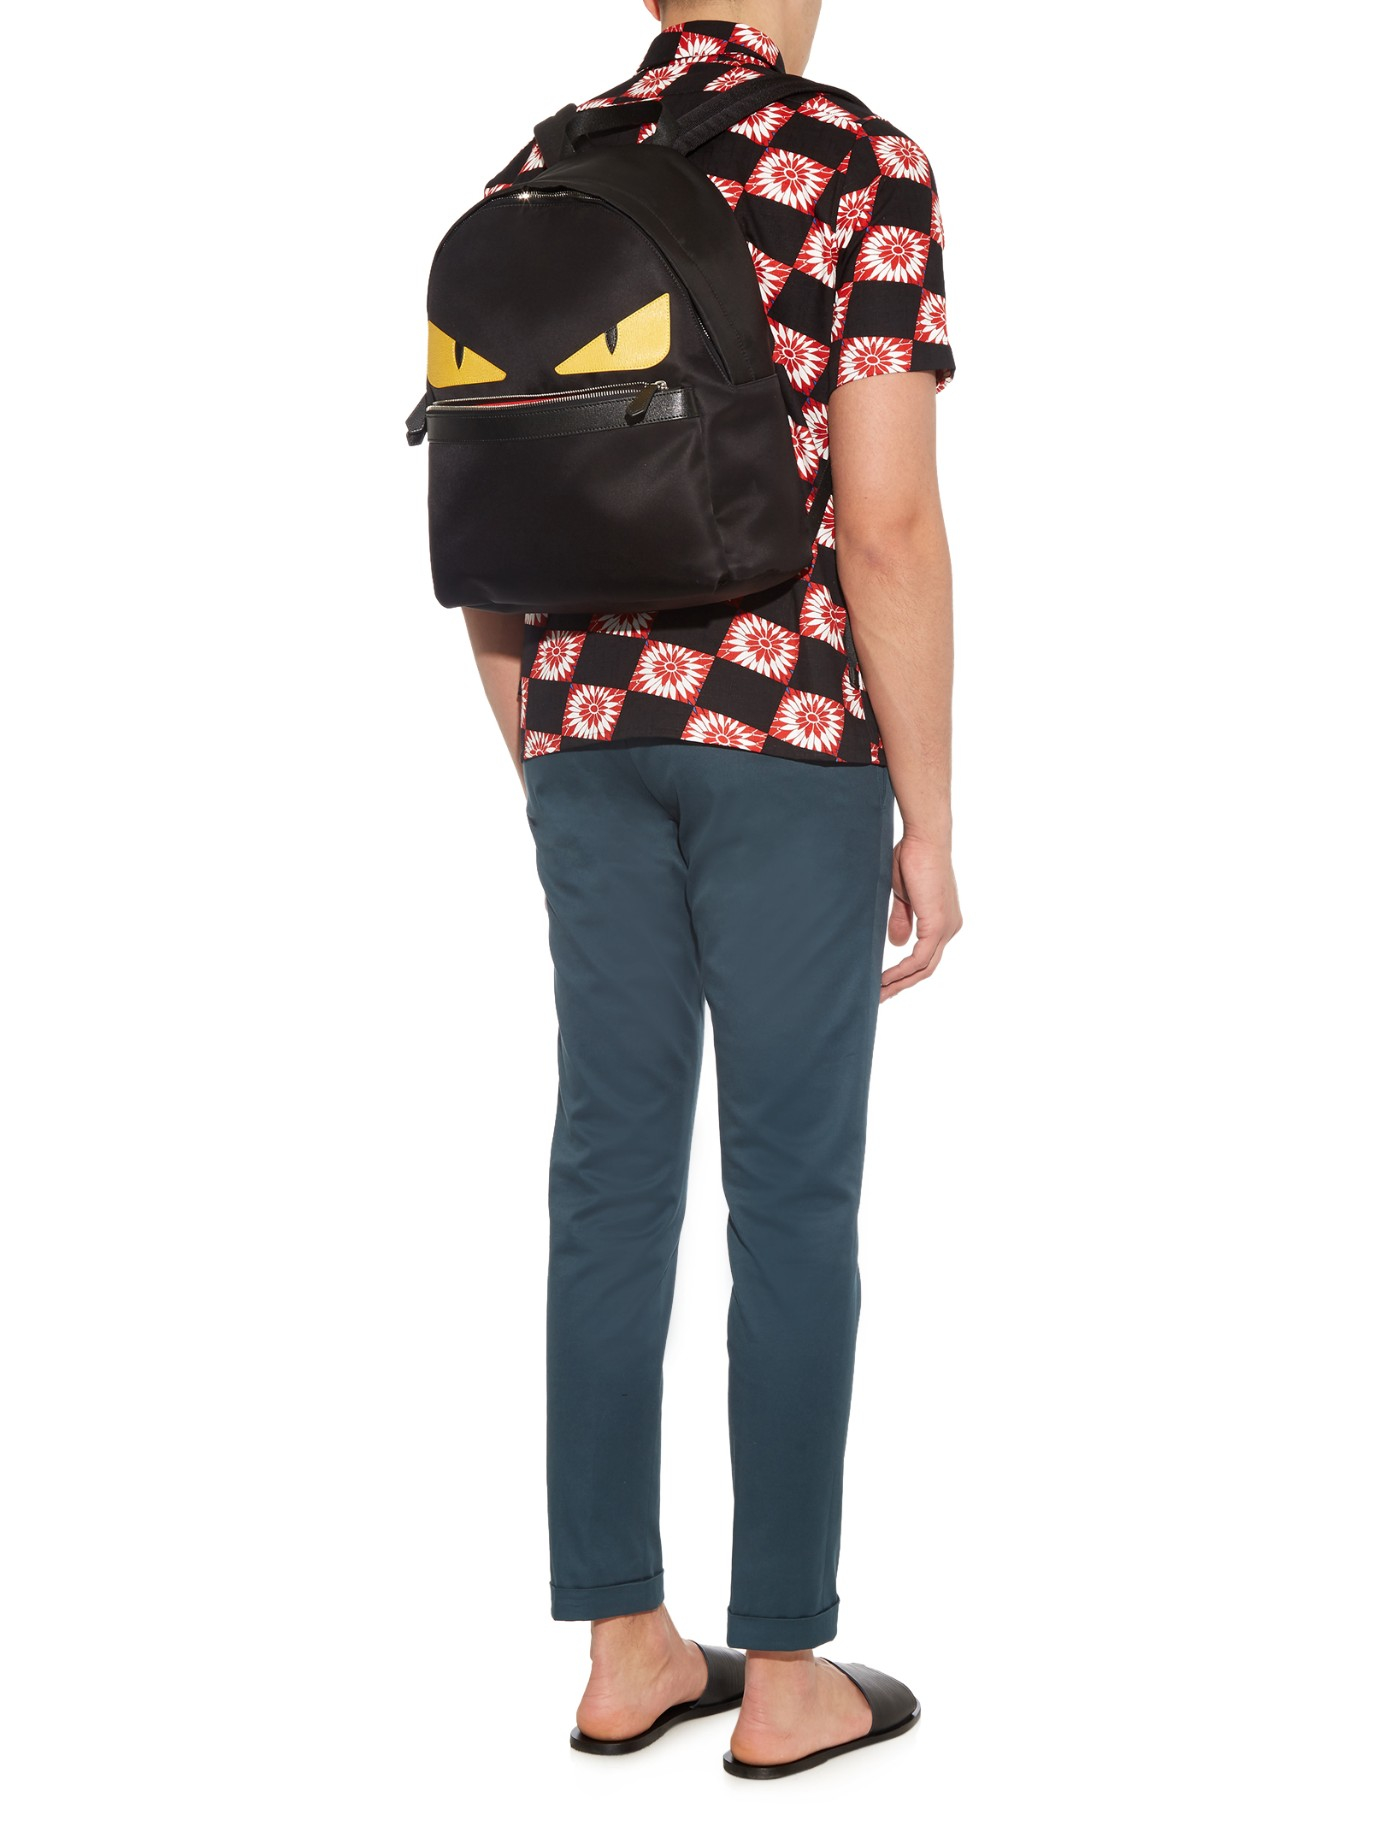 e59f35665509 Fendi Bag Bugs Nylon And Leather Backpack in Black for Men - Lyst